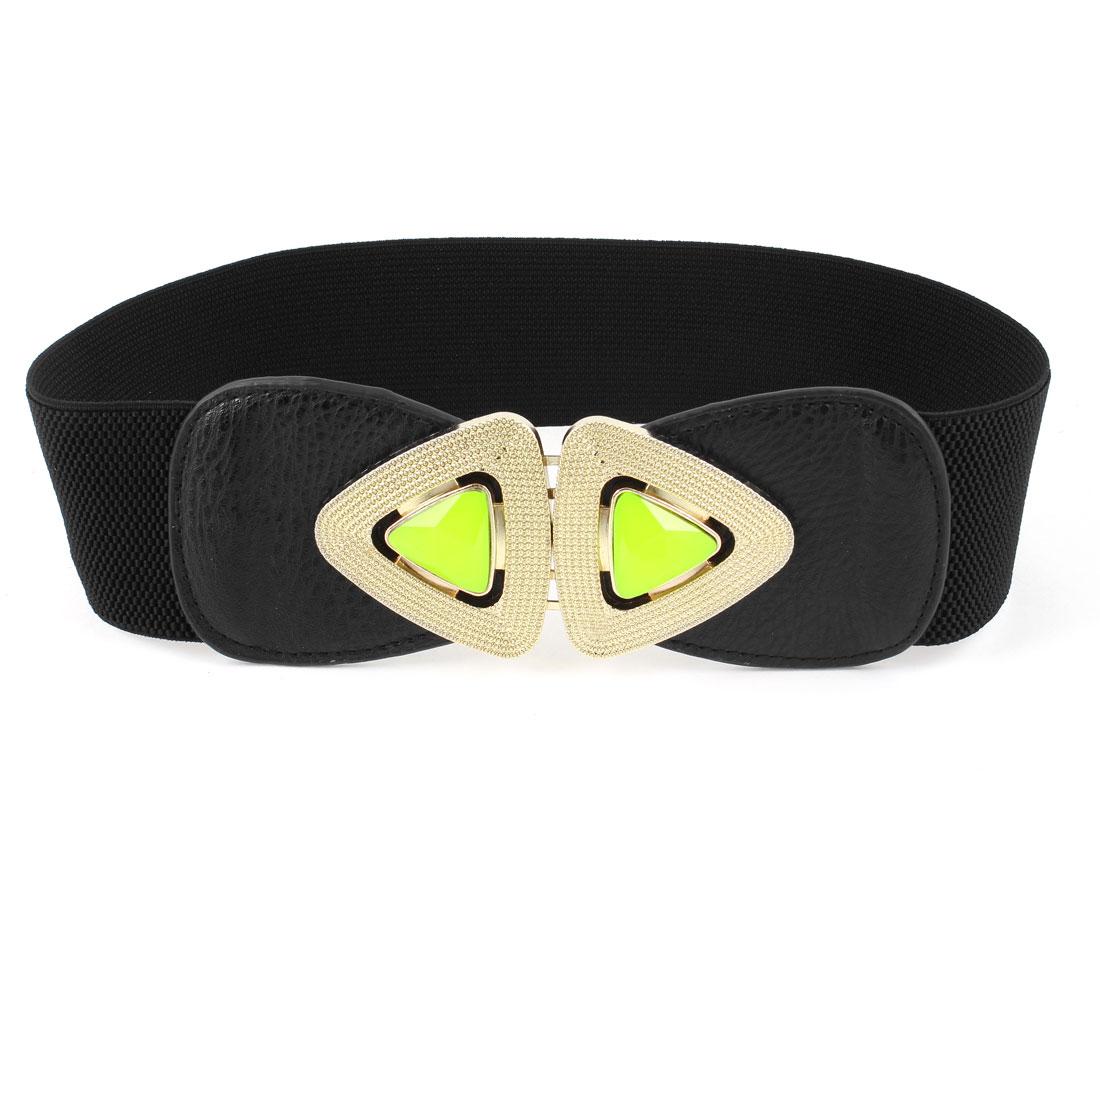 Lady Faux Leather Front Plastic Faceted Bead Black Interlock Buckle Waist Belt